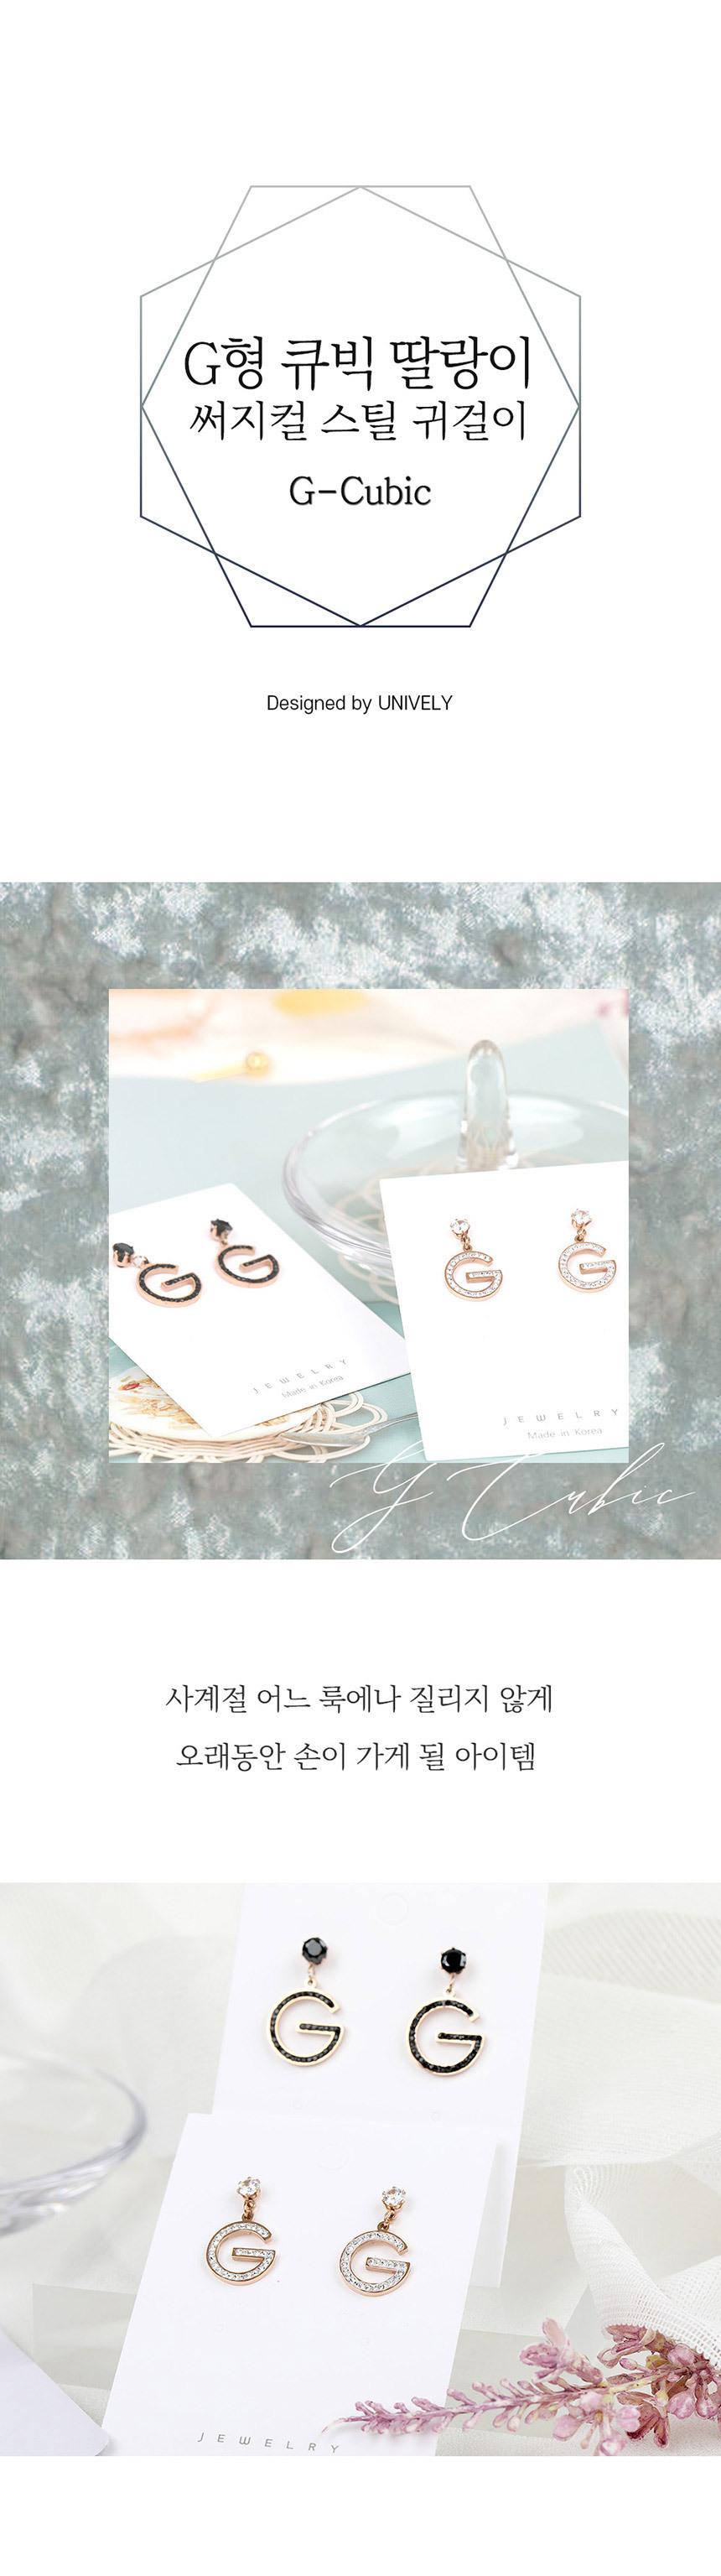 G형 큐빅 딸랑이 써지컬 스틸 귀걸이 링 드롭 여자 - 링코, 9,900원, 실버, 드롭귀걸이